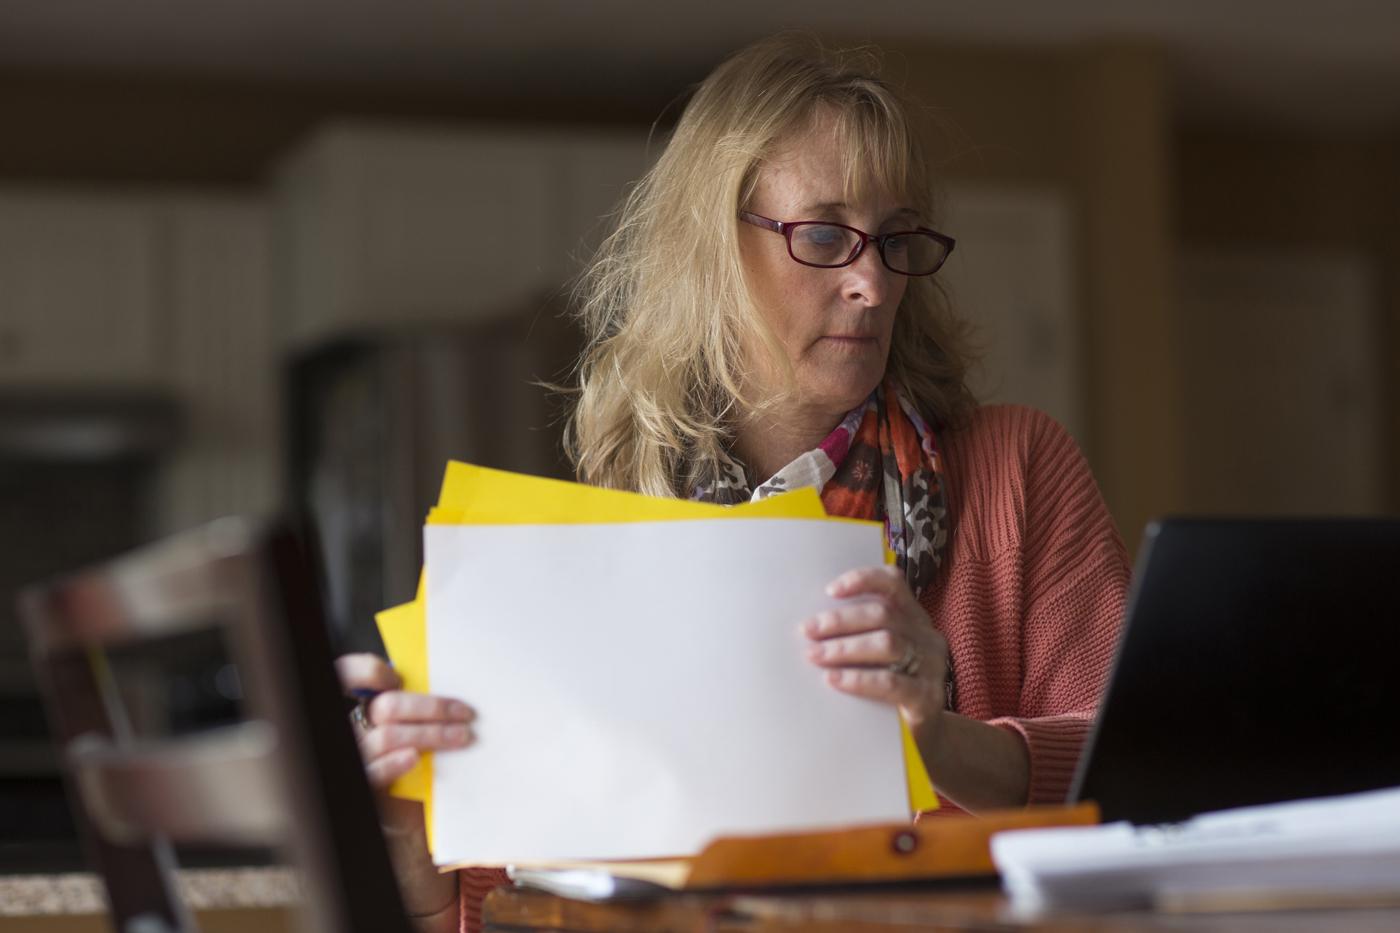 Faith organizes her paperwork.